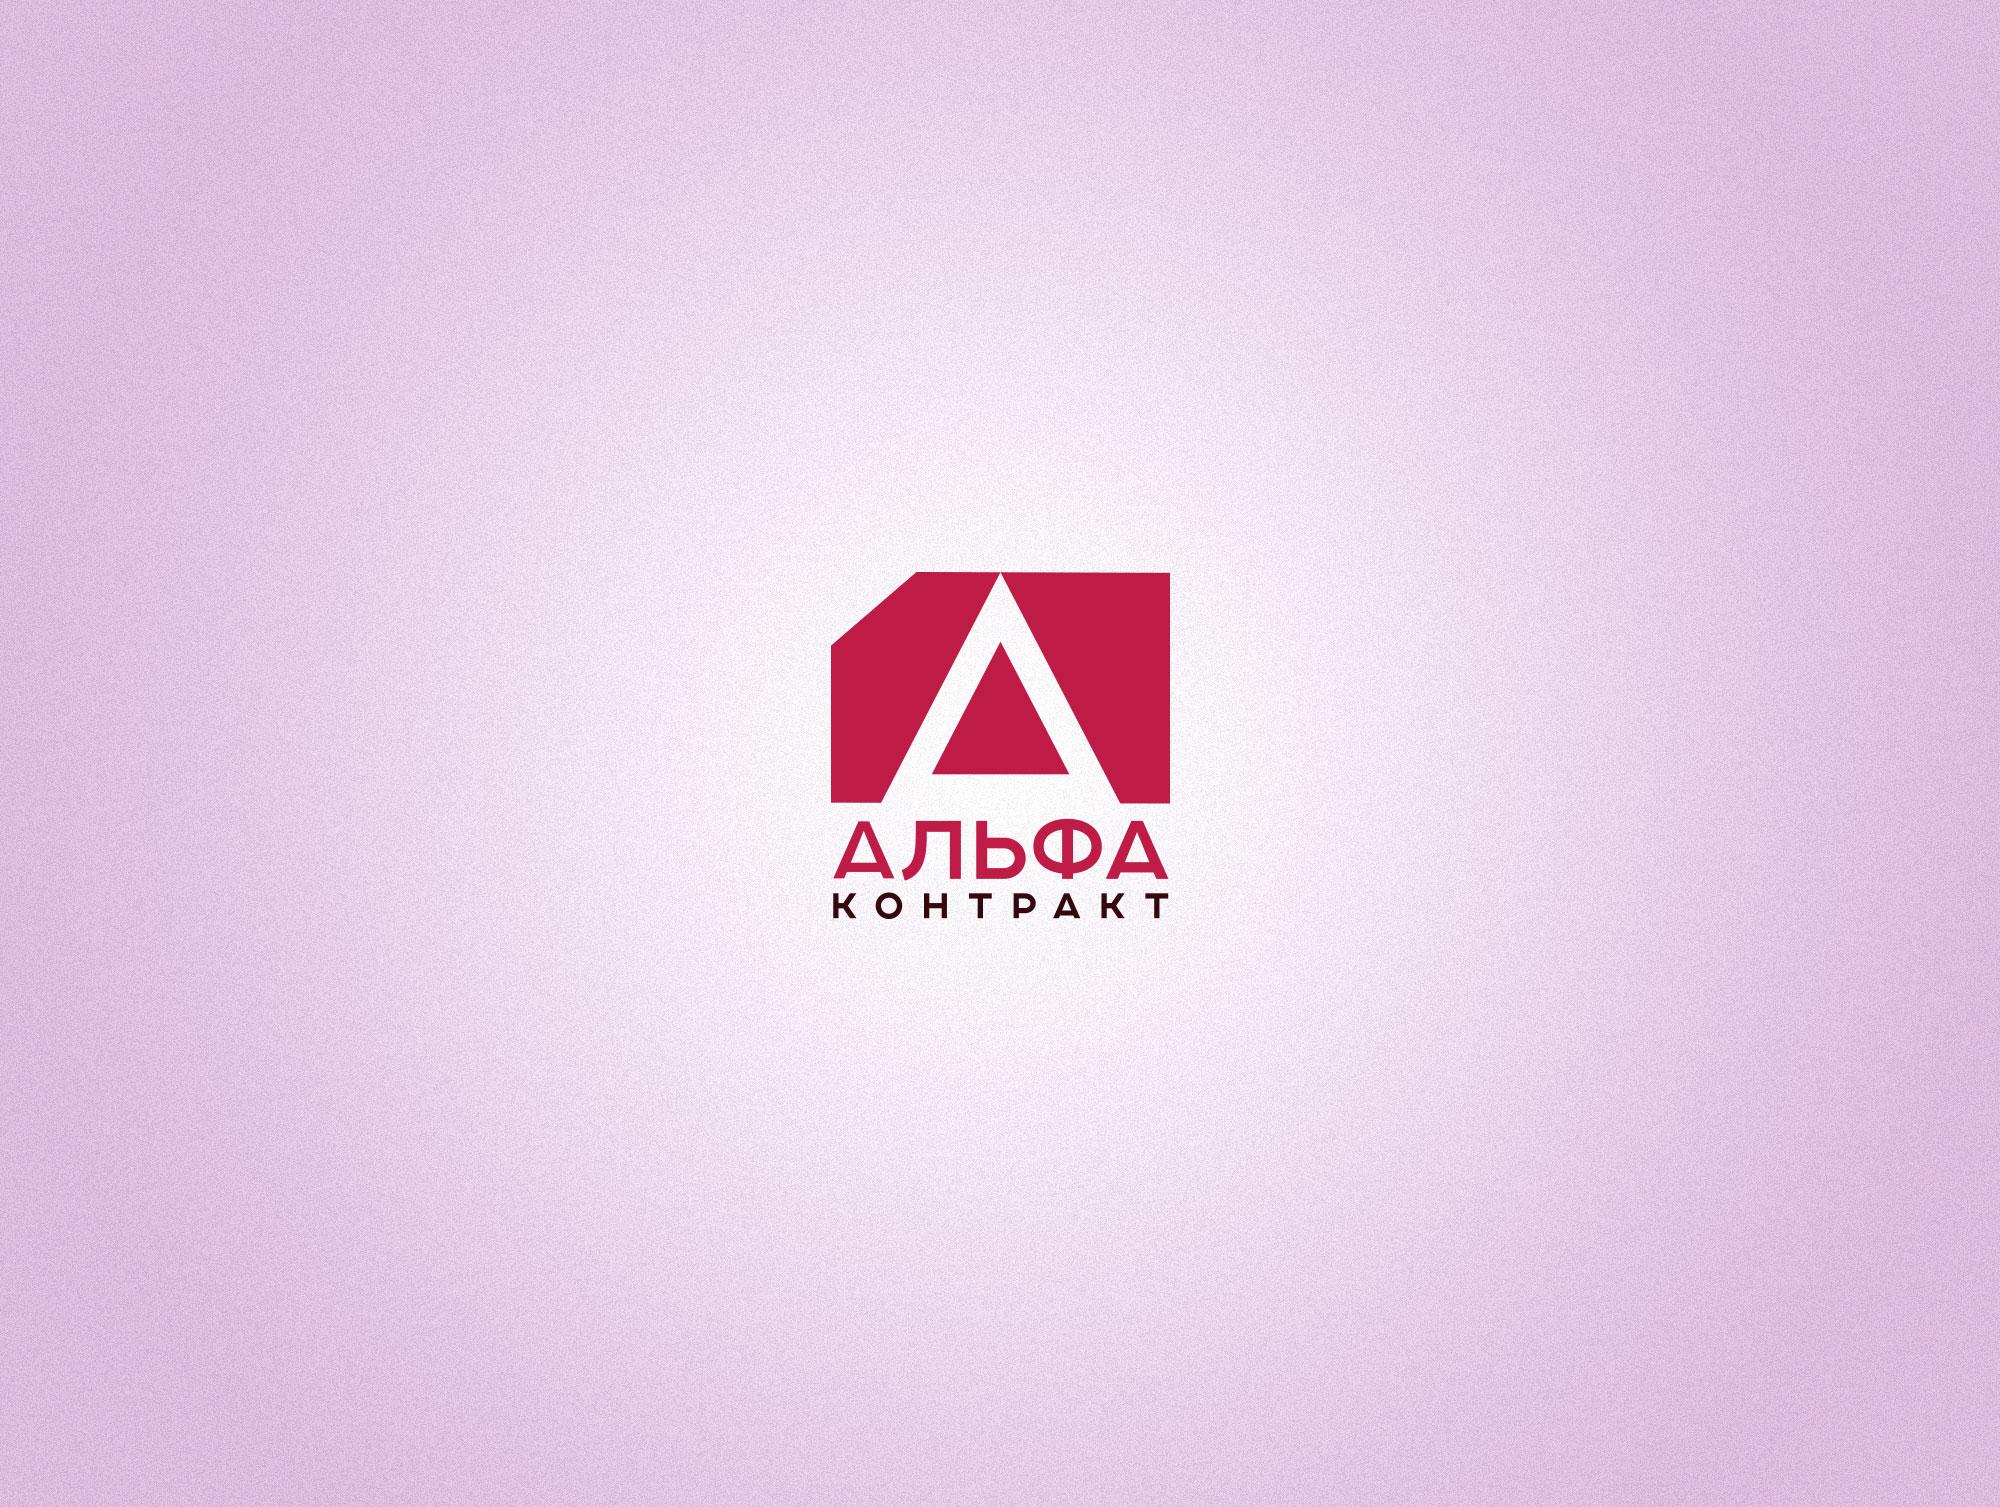 Дизайнер для разработки логотипа компании фото f_6885bfa0f0924d72.jpg